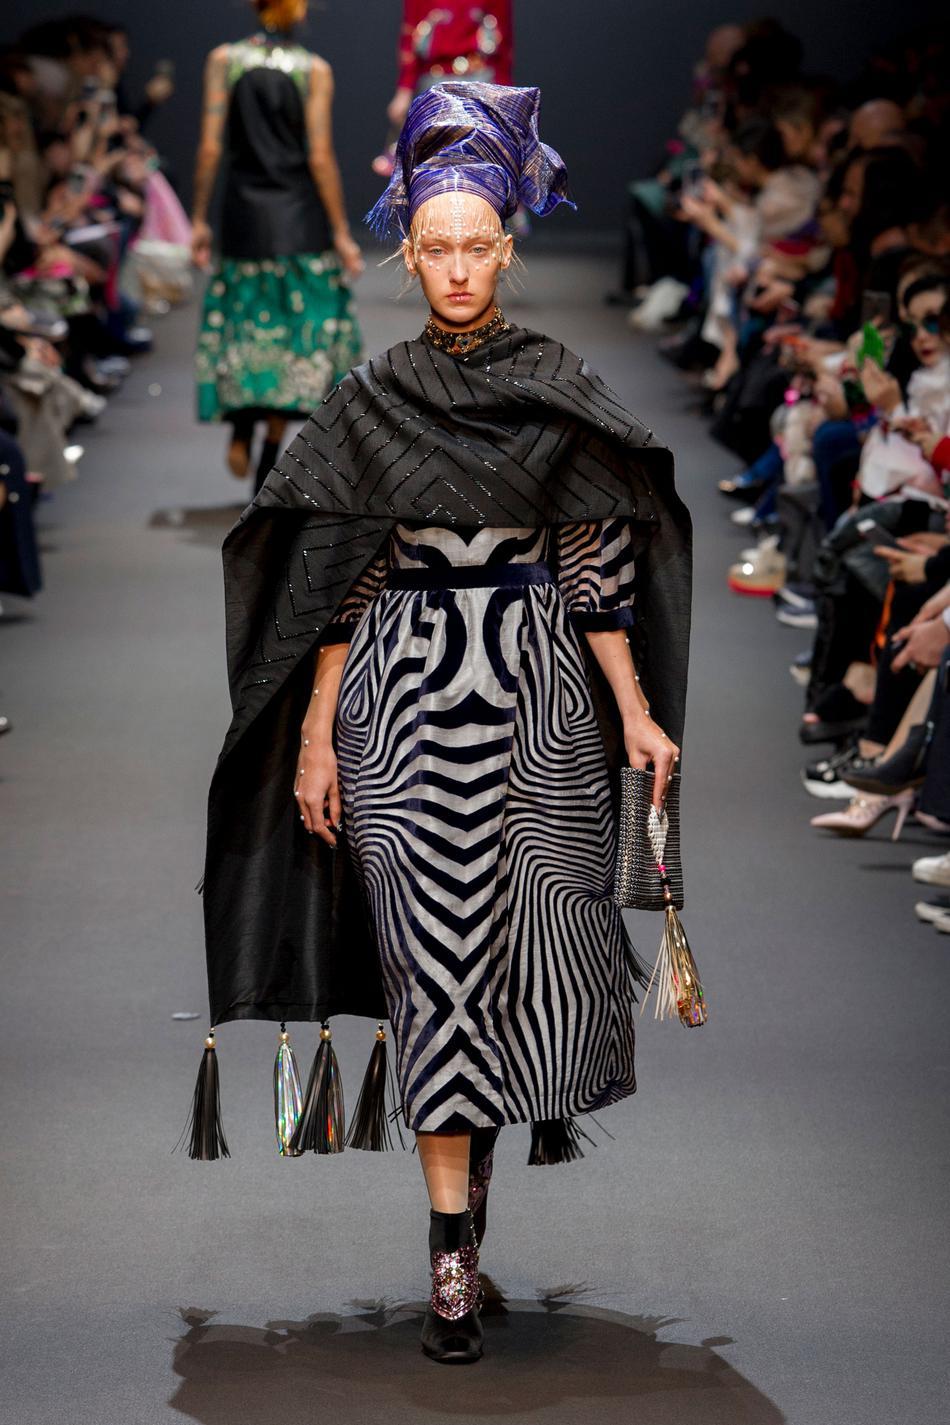 Défilé Manish Arora Fashion Week 2017 - Look 23